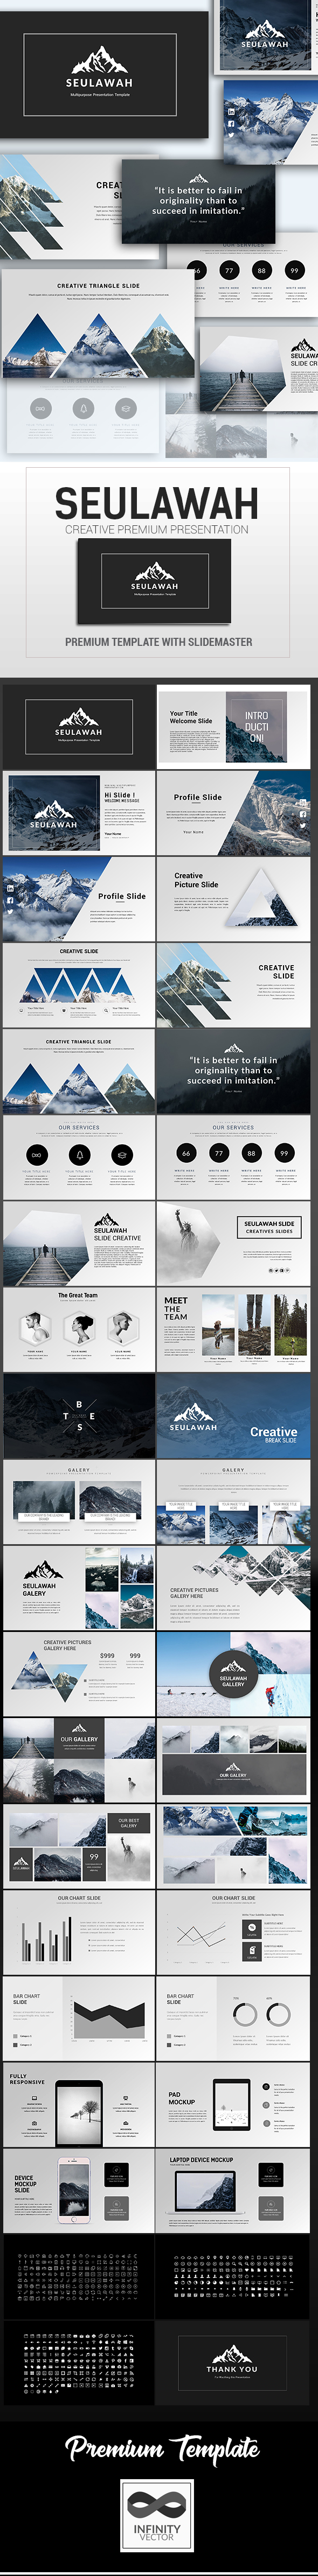 Seulawah Creative Presentation - PowerPoint Templates Presentation Templates